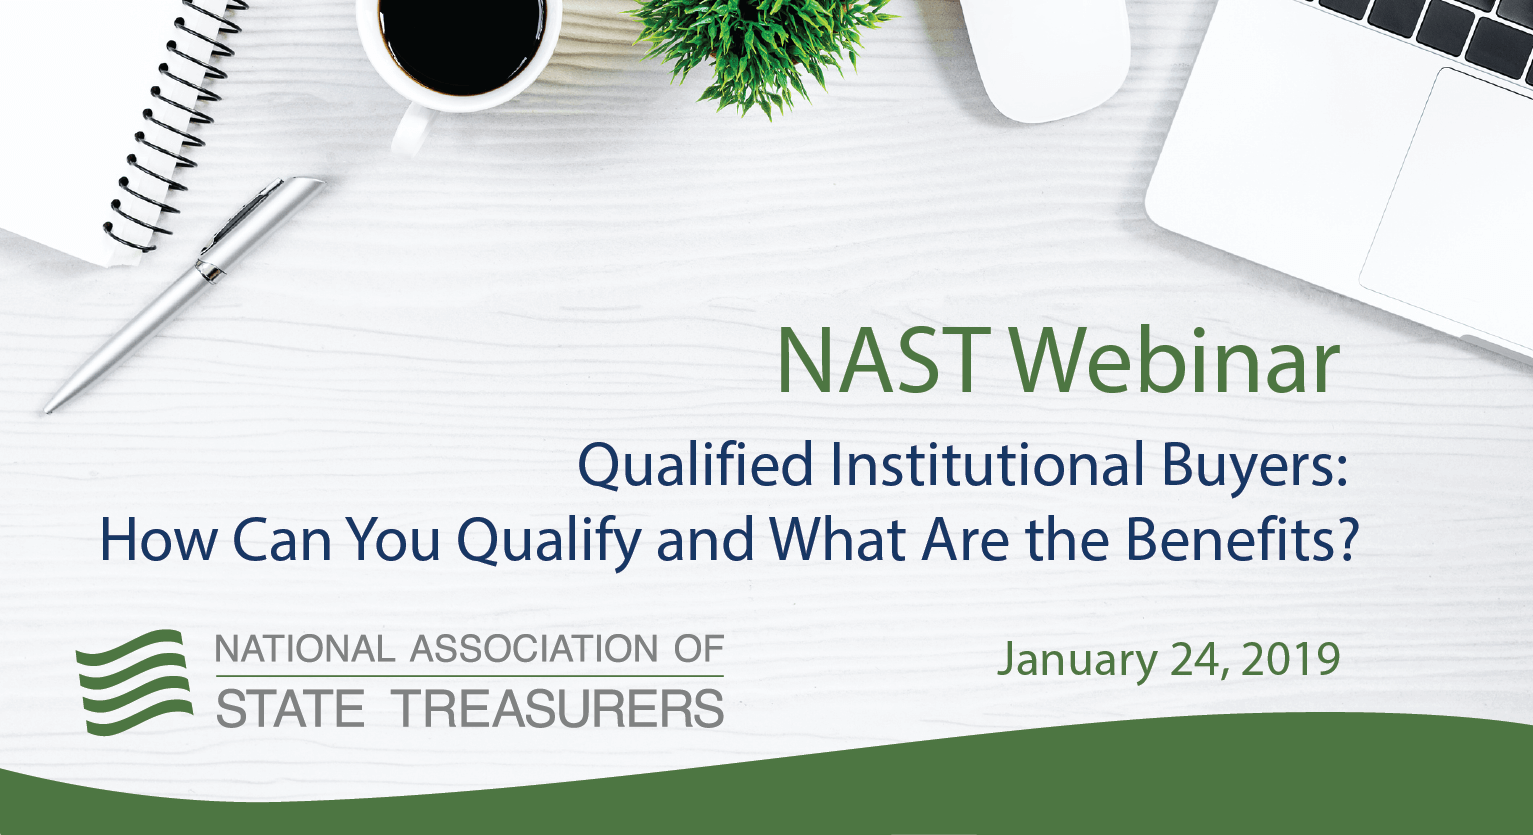 NAST Webinar - Qualified Institutional Buyers